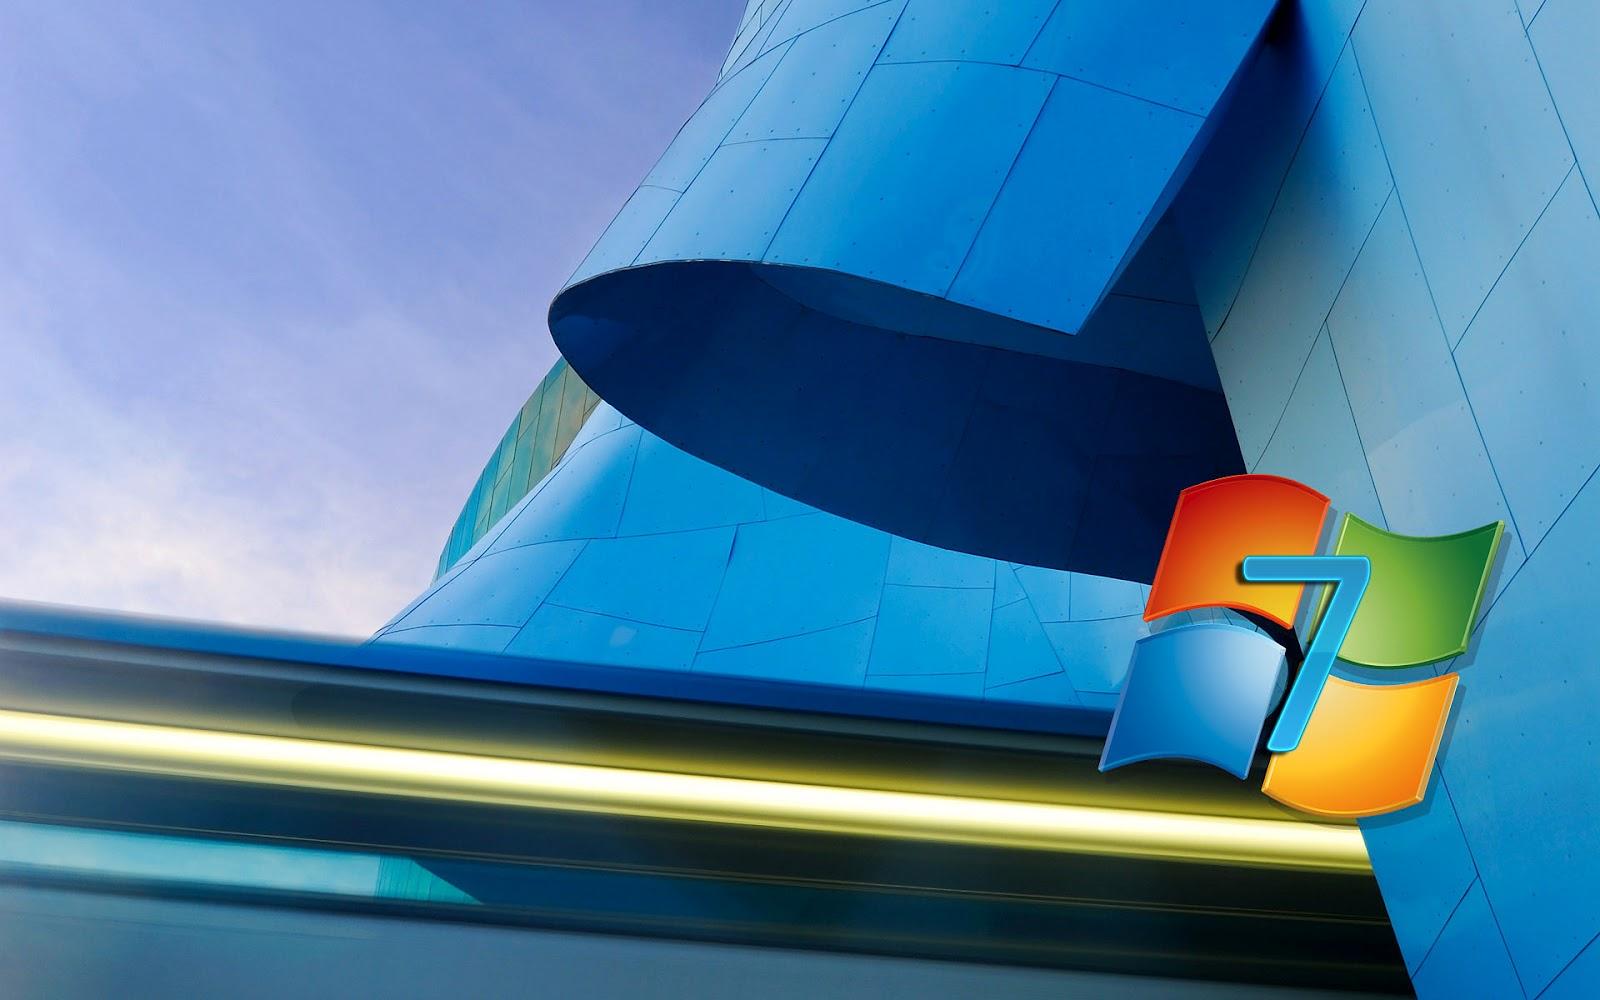 http://2.bp.blogspot.com/-CJghLVvlpVk/T_3ORVUWB6I/AAAAAAAABzA/x4-hemWRNiY/s1600/hd-blauwe-windows-7-achtergrond-hd-wallpaper+(2).jpg